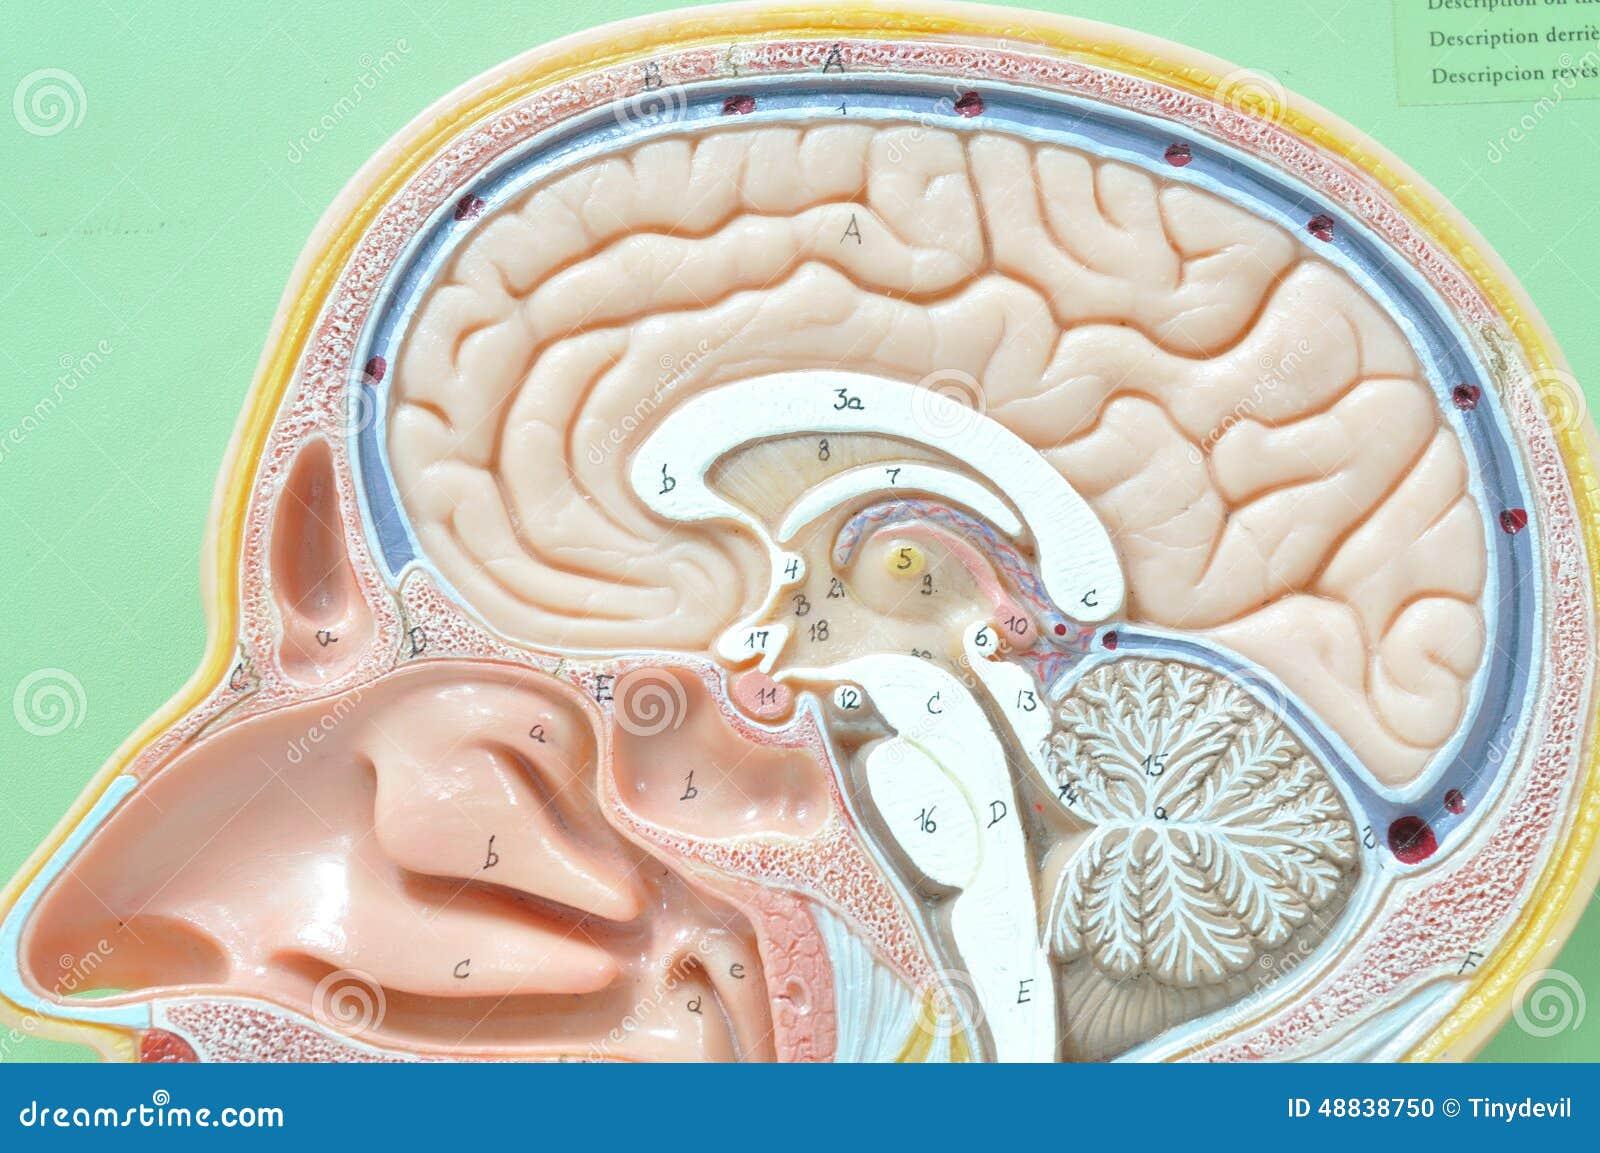 Human Brain Model Stock Photo Image Of Concept Inspiration 48838750